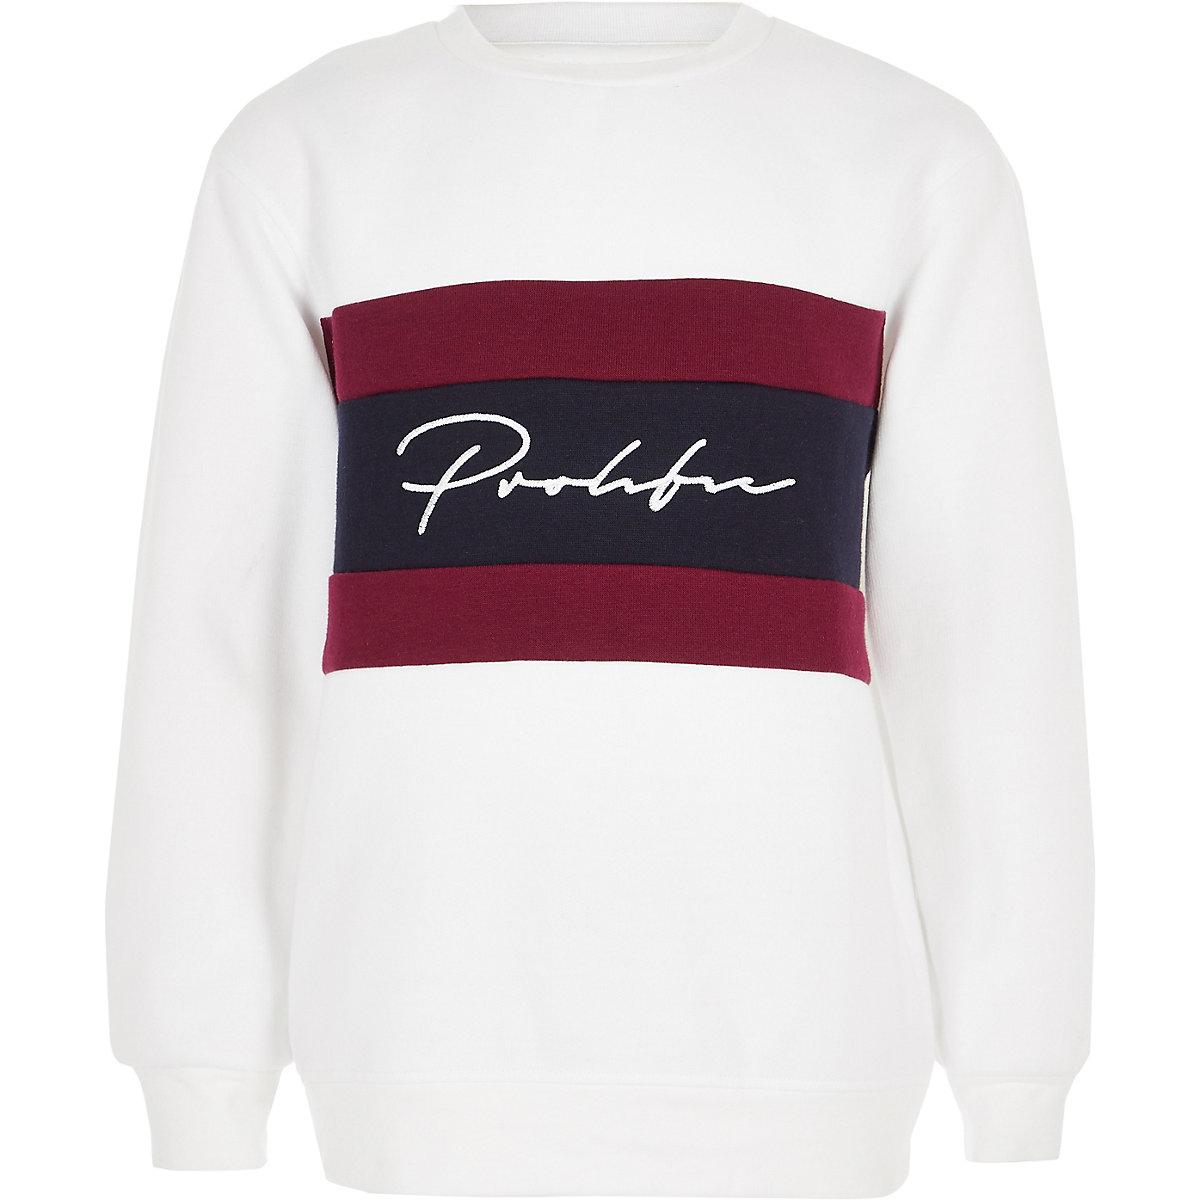 Boys white prolific block sweatshirt